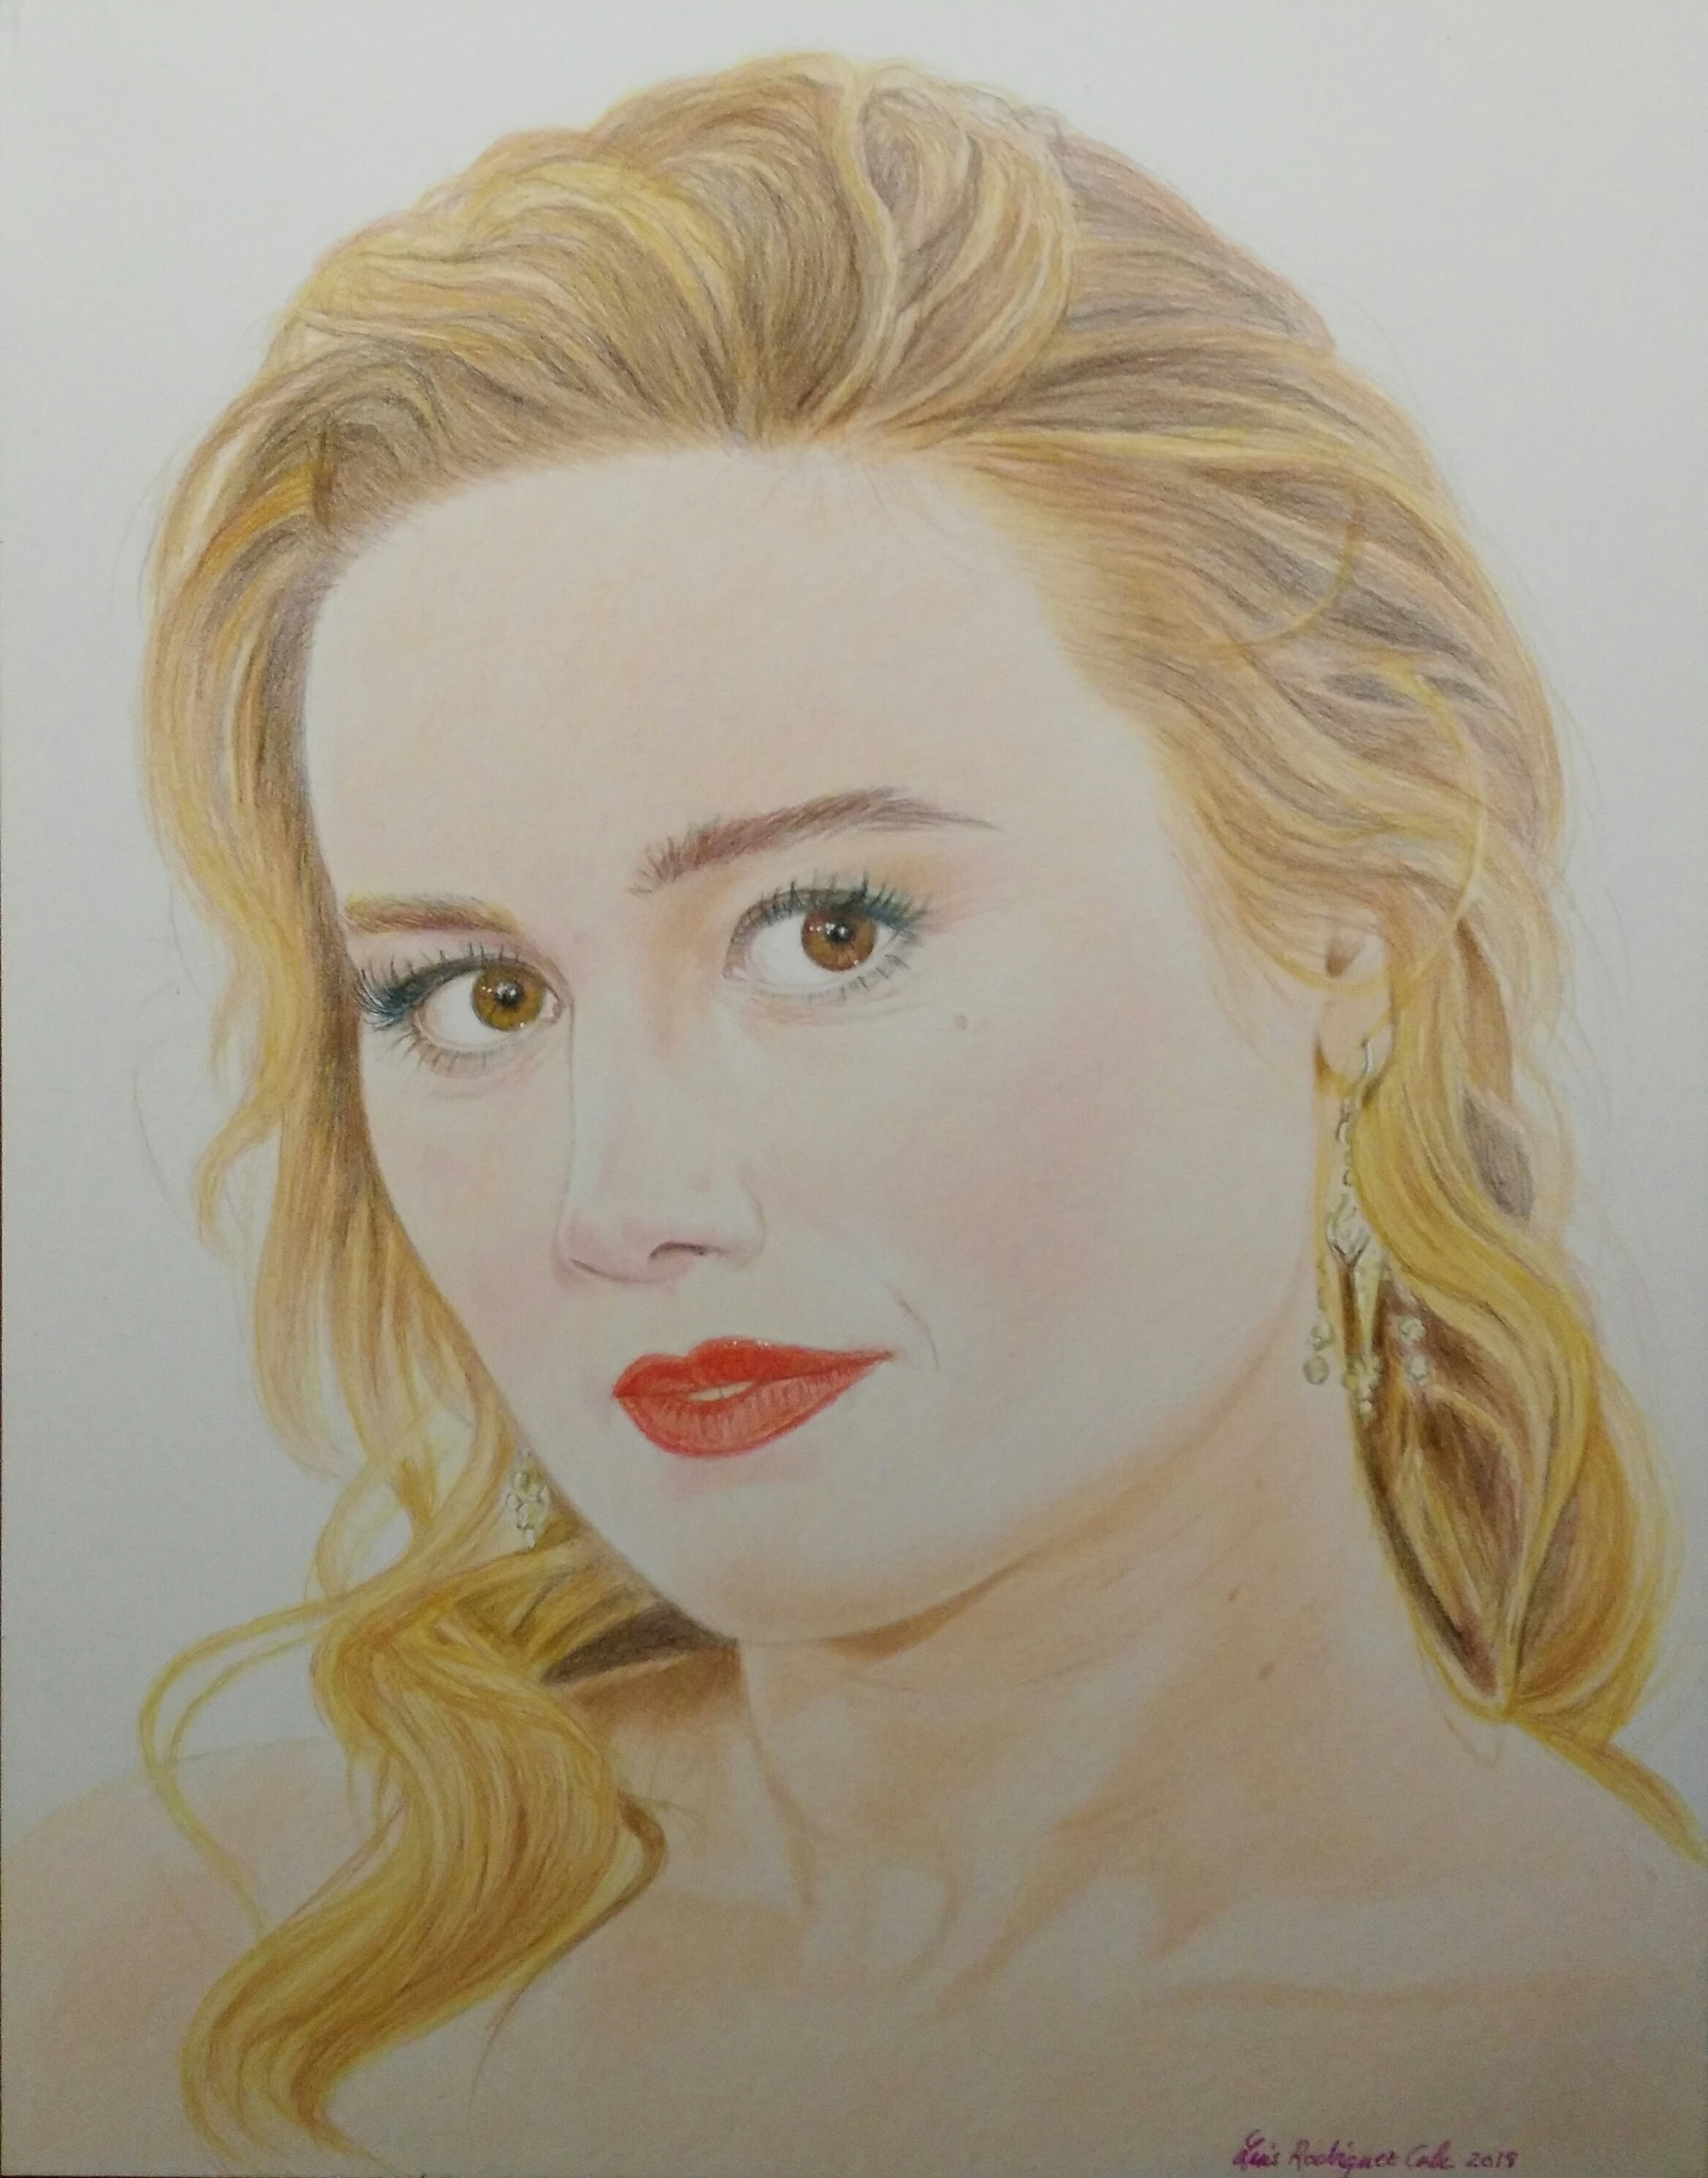 Brie Larson, actriz